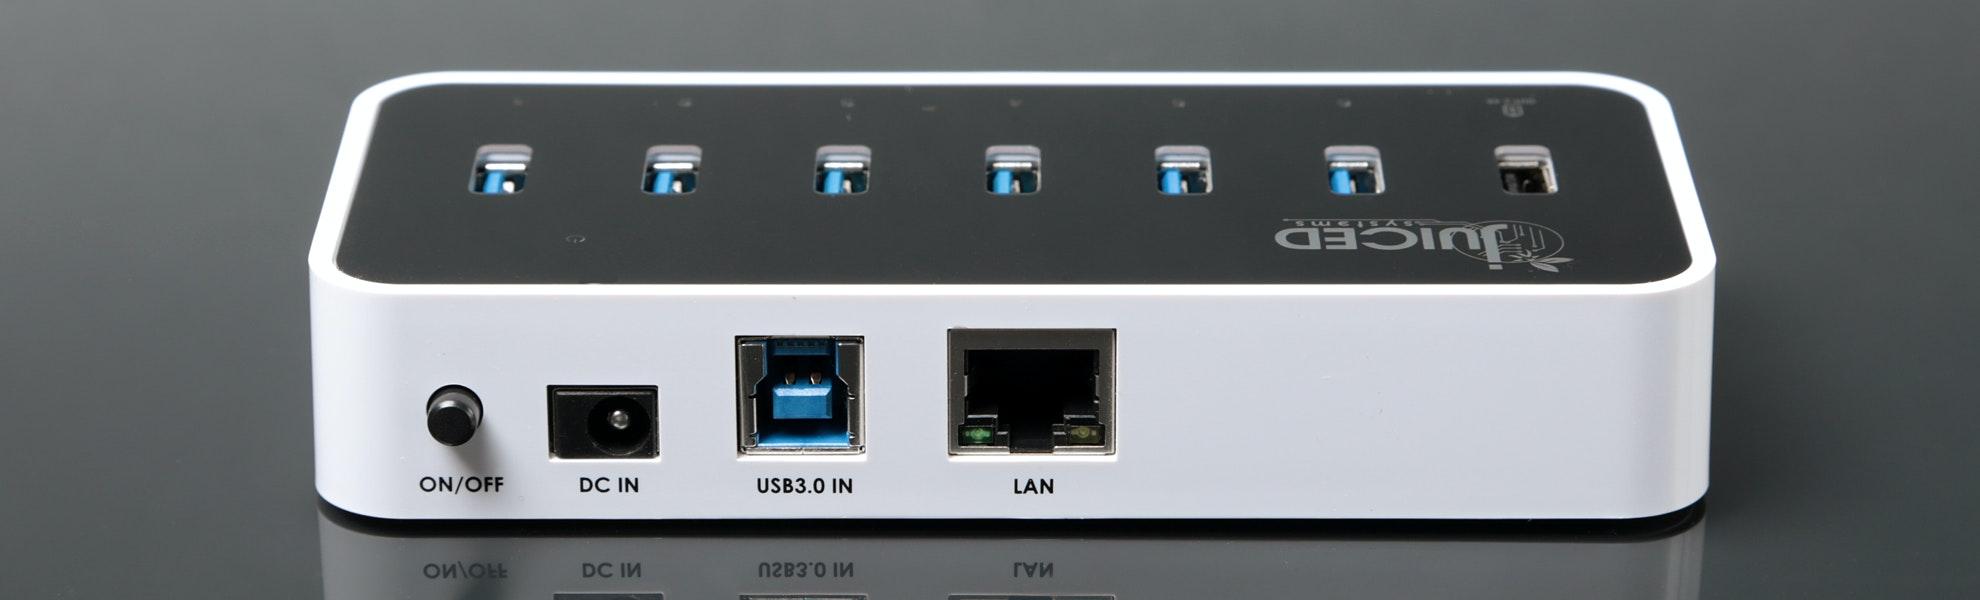 Juiced Systems USB 3.0 6+1+1 Hub